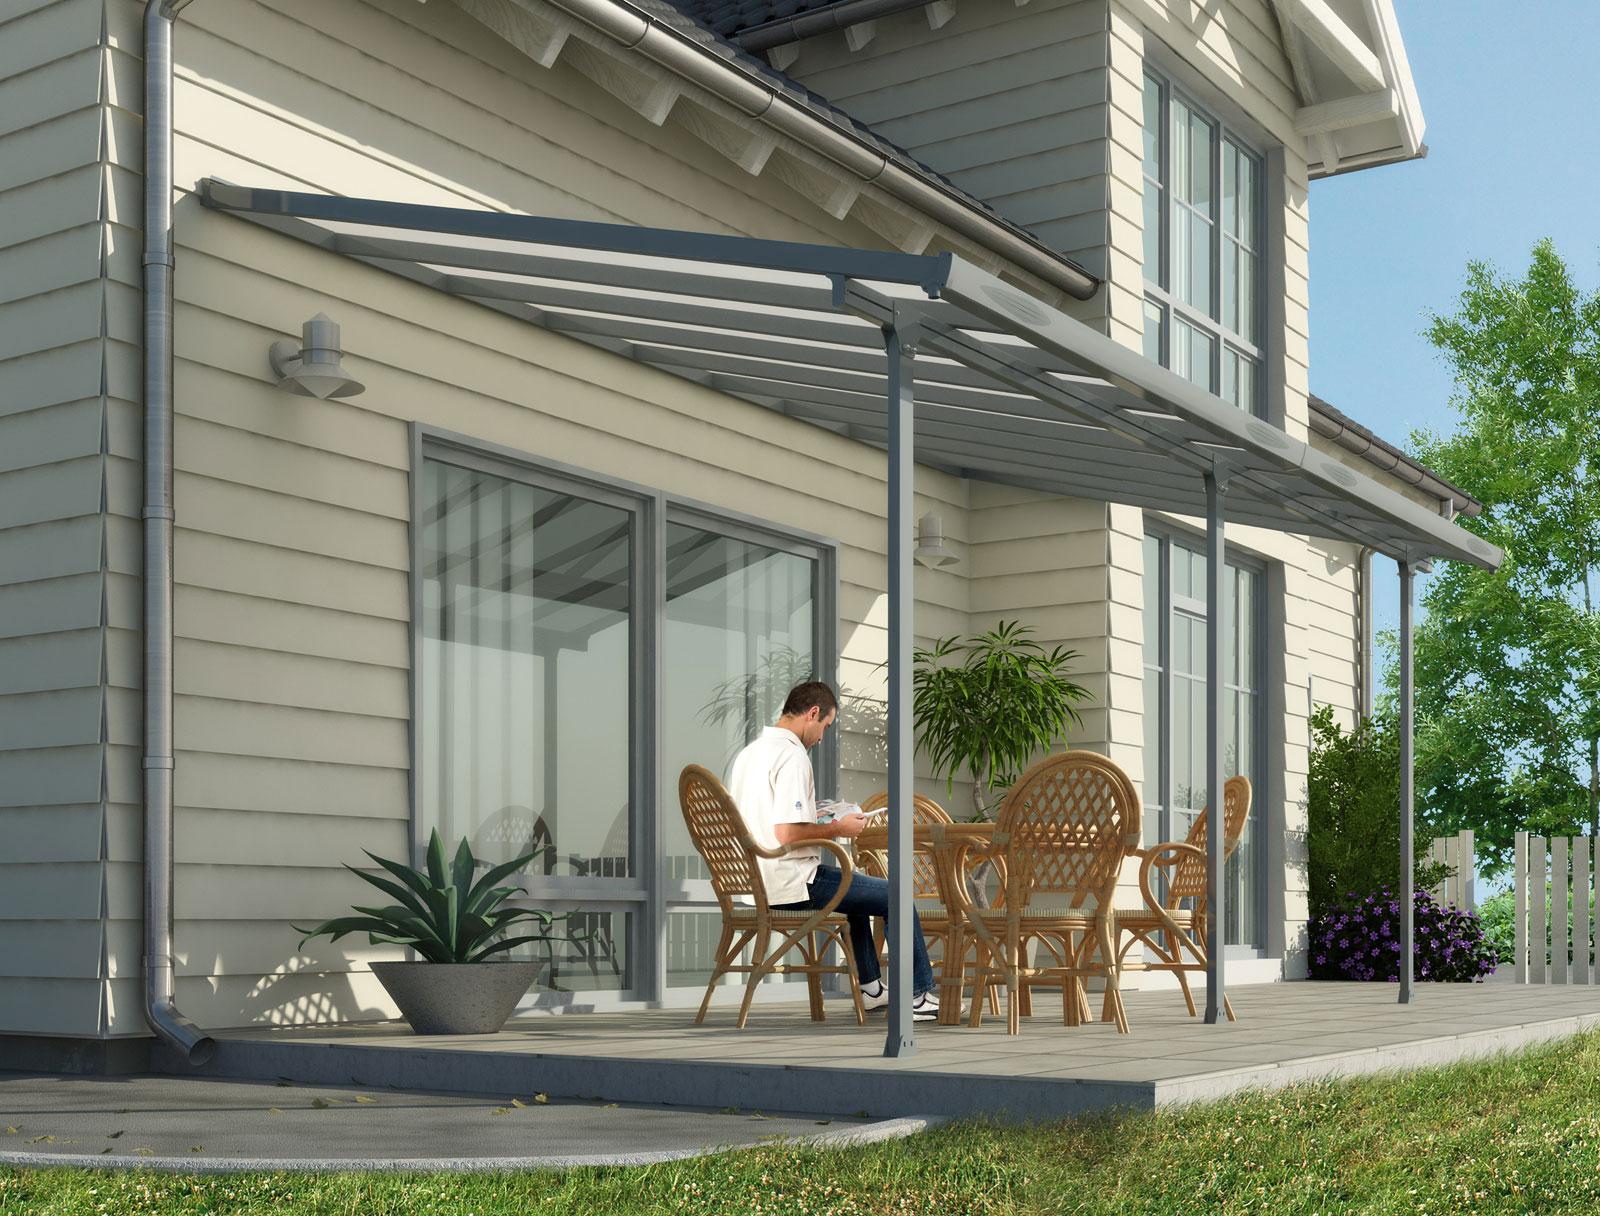 Terrassenüberdachung / Carport Alu grau / Hohlkammerplatten ...